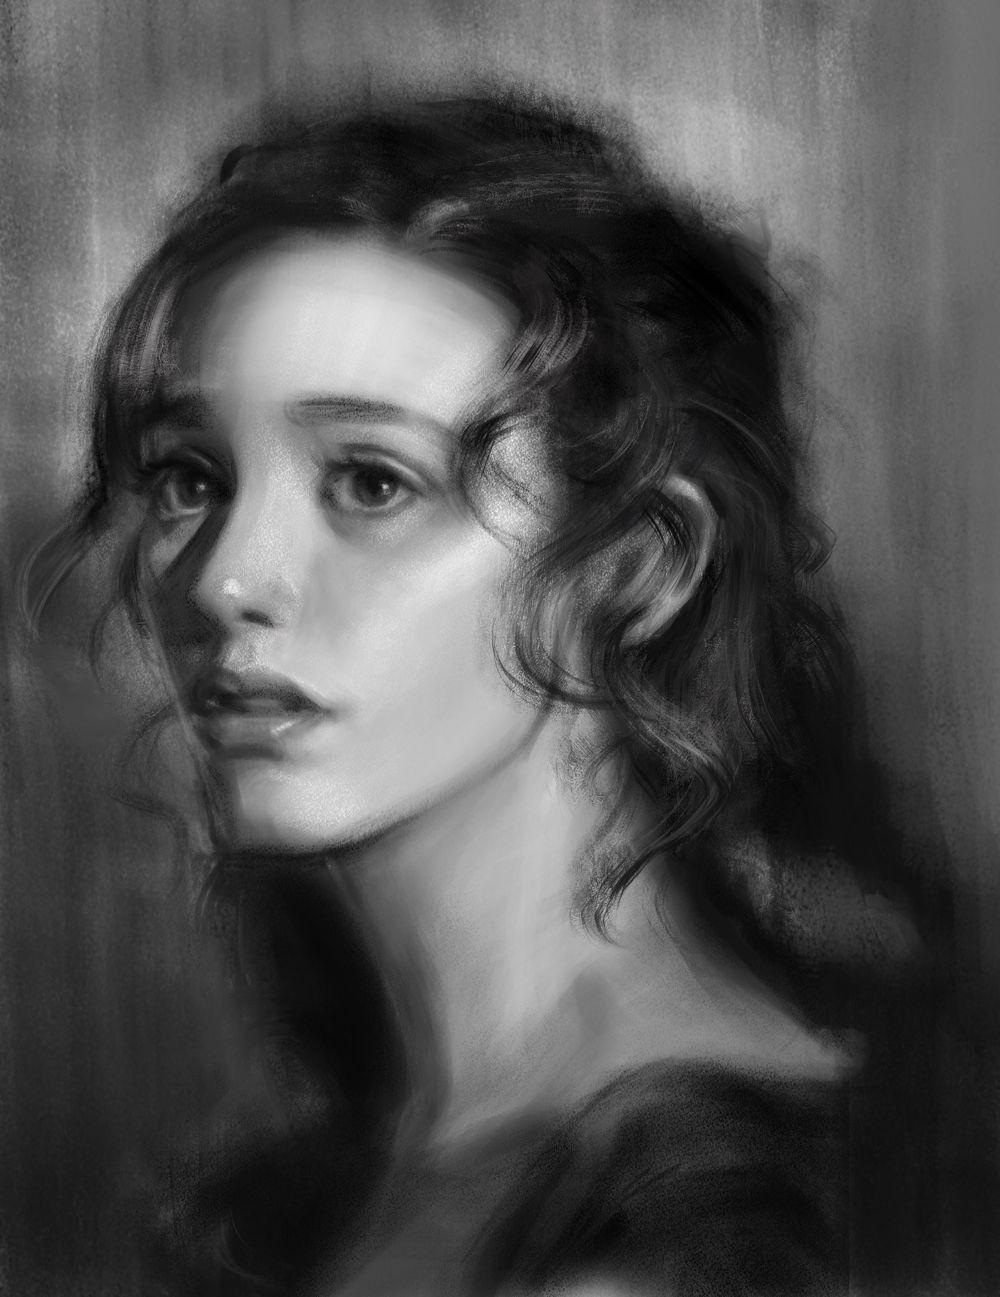 Portraits - image 22 - student project